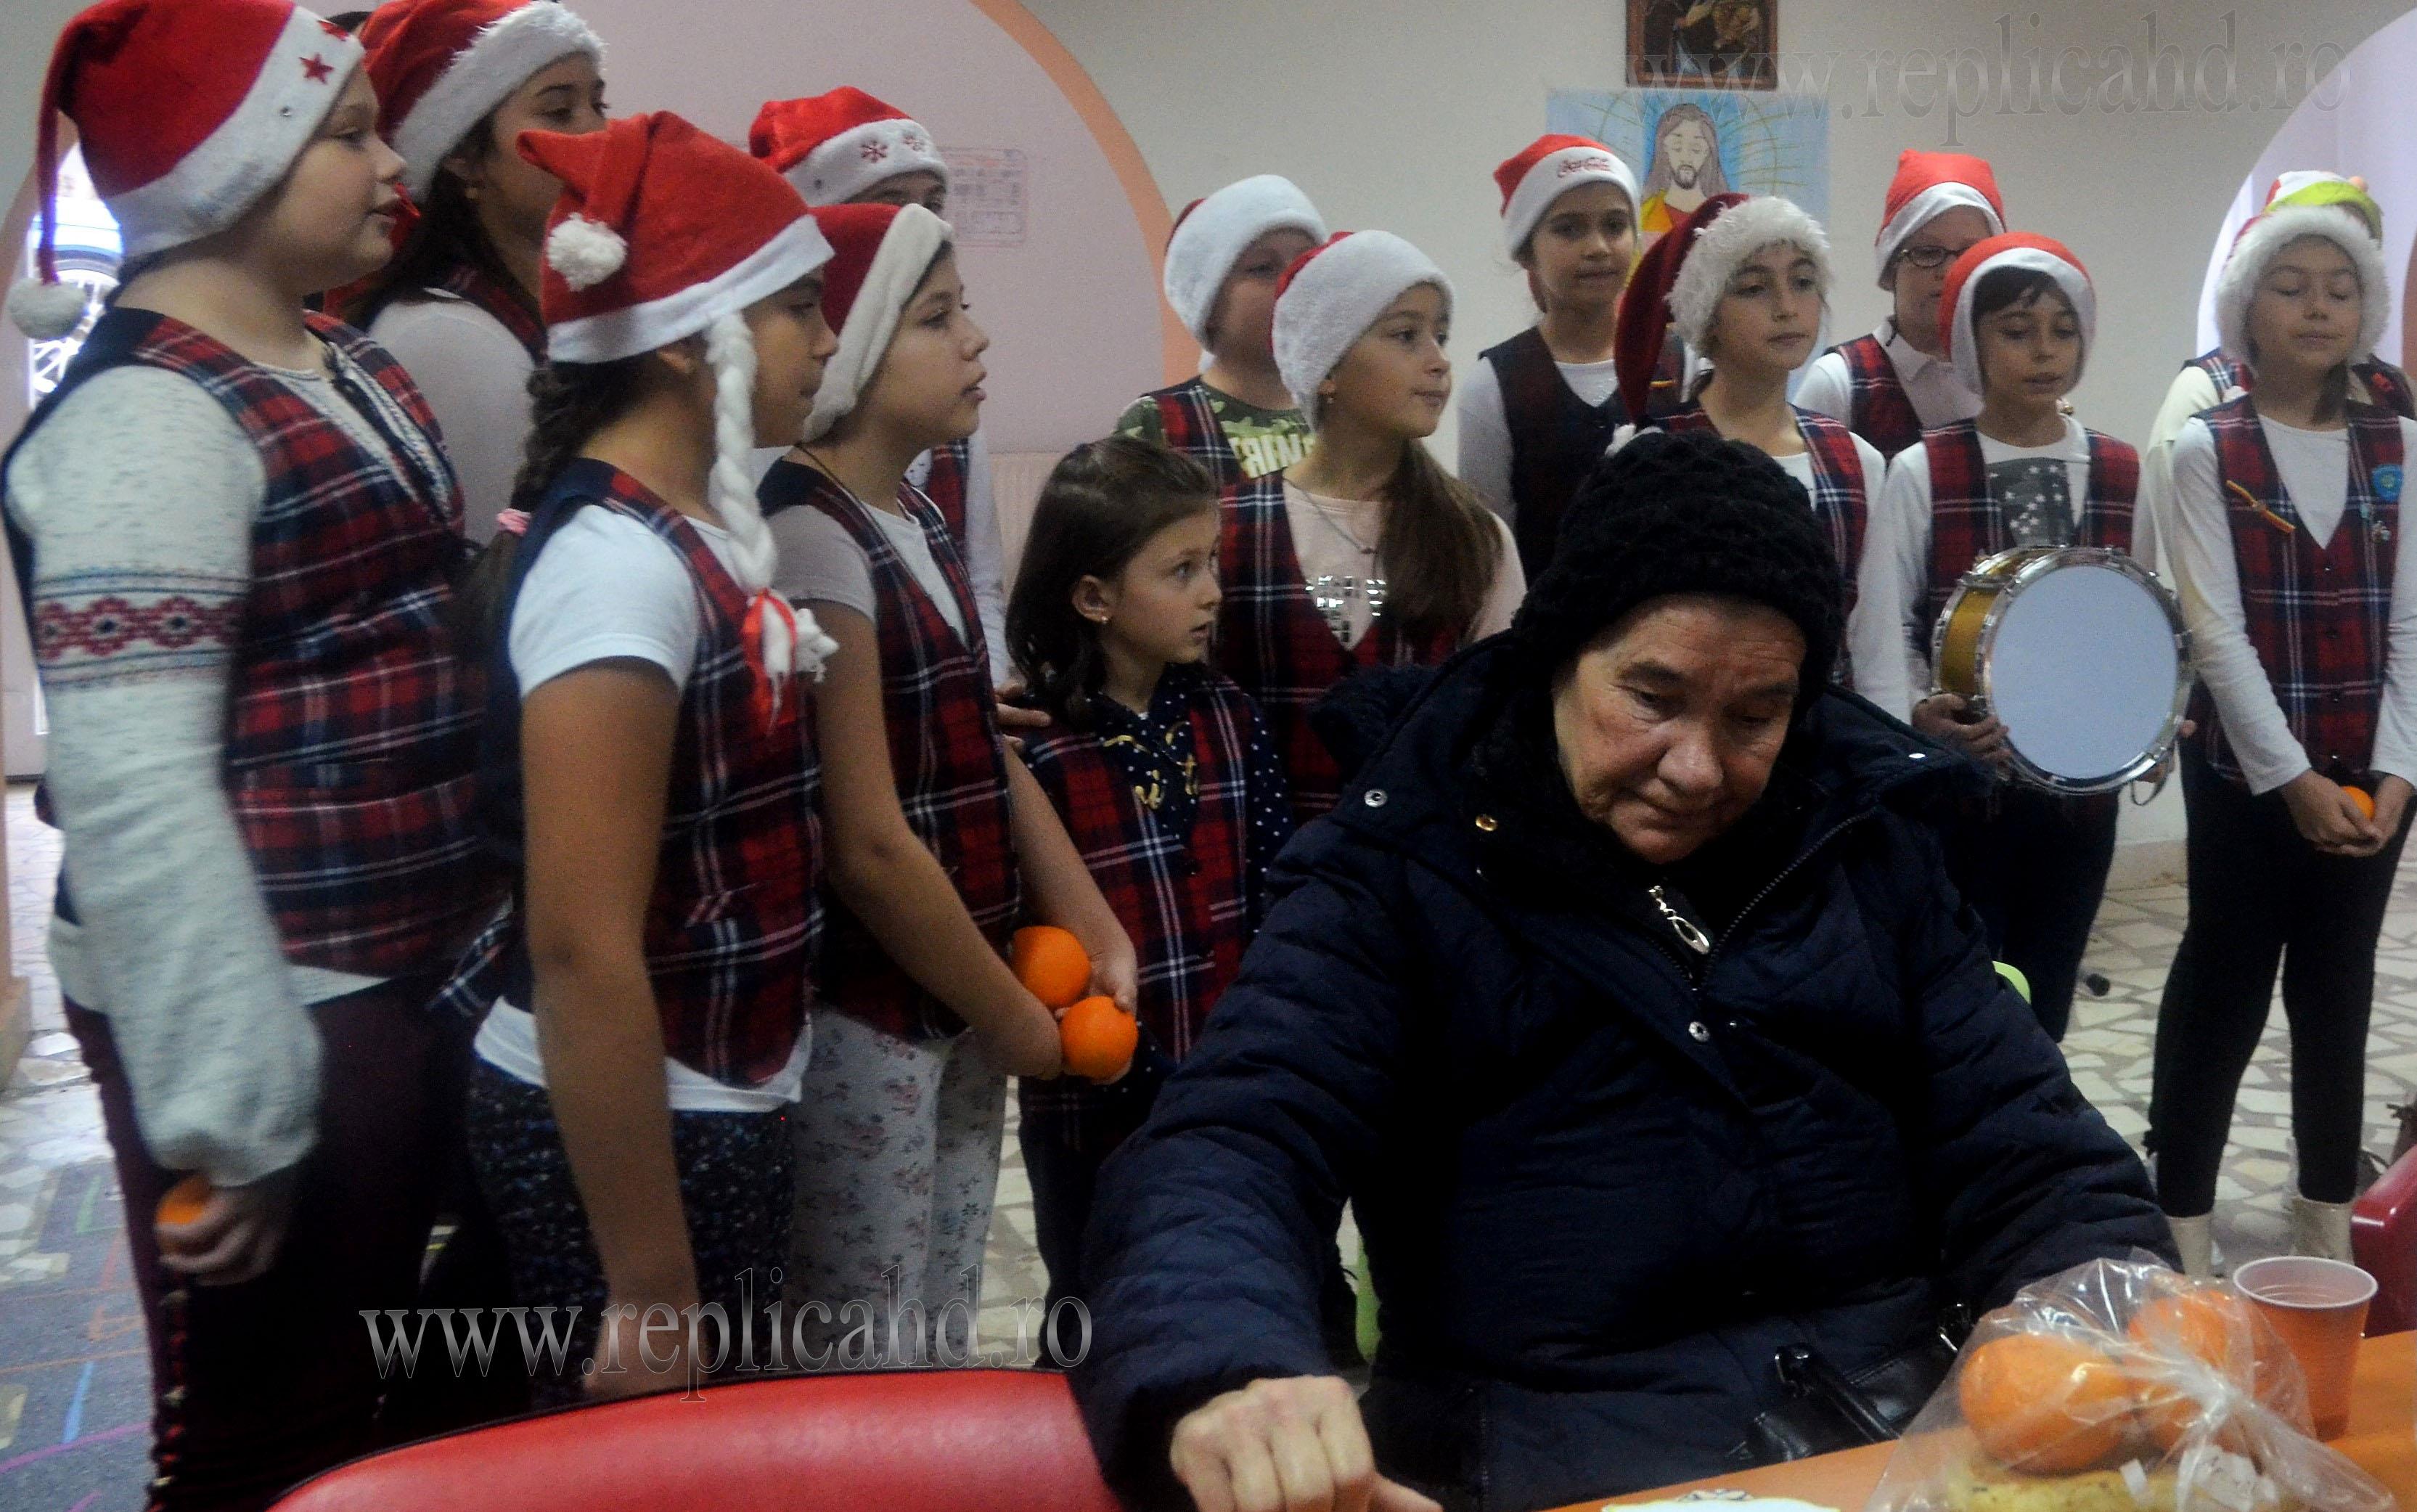 Voluntarii au vizitat centrul social Sf. Nectarie, din Deva